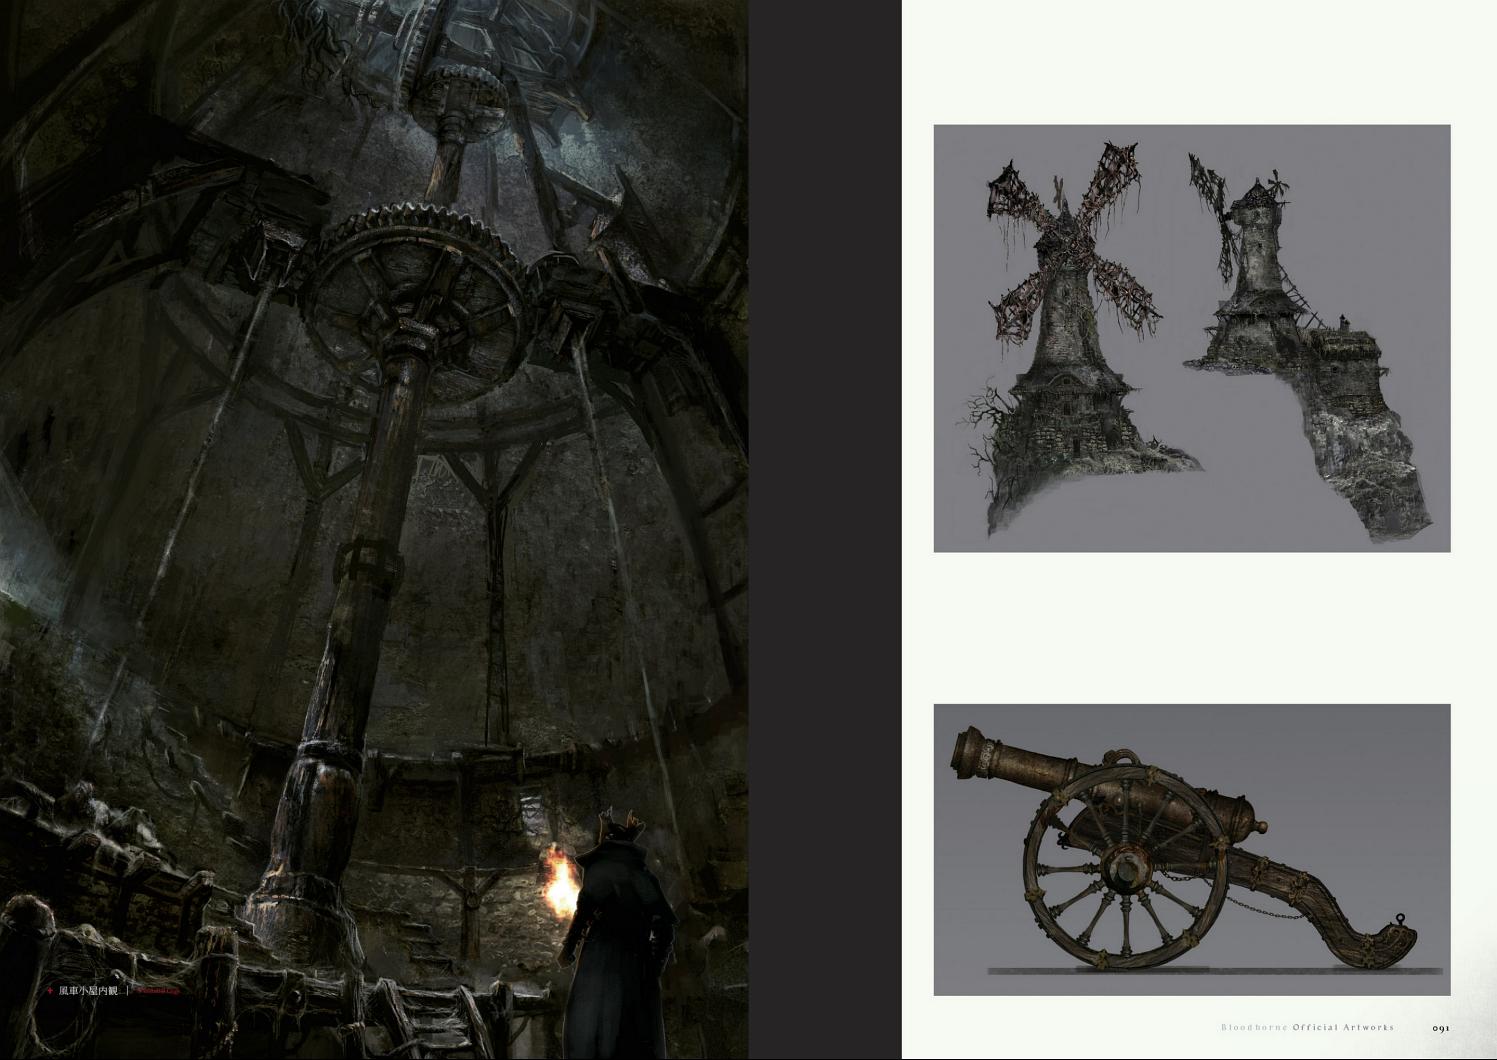 Pin By Cari Bethards On Bloodborne Bloodborne Concept Art Concept Art Bloodborne